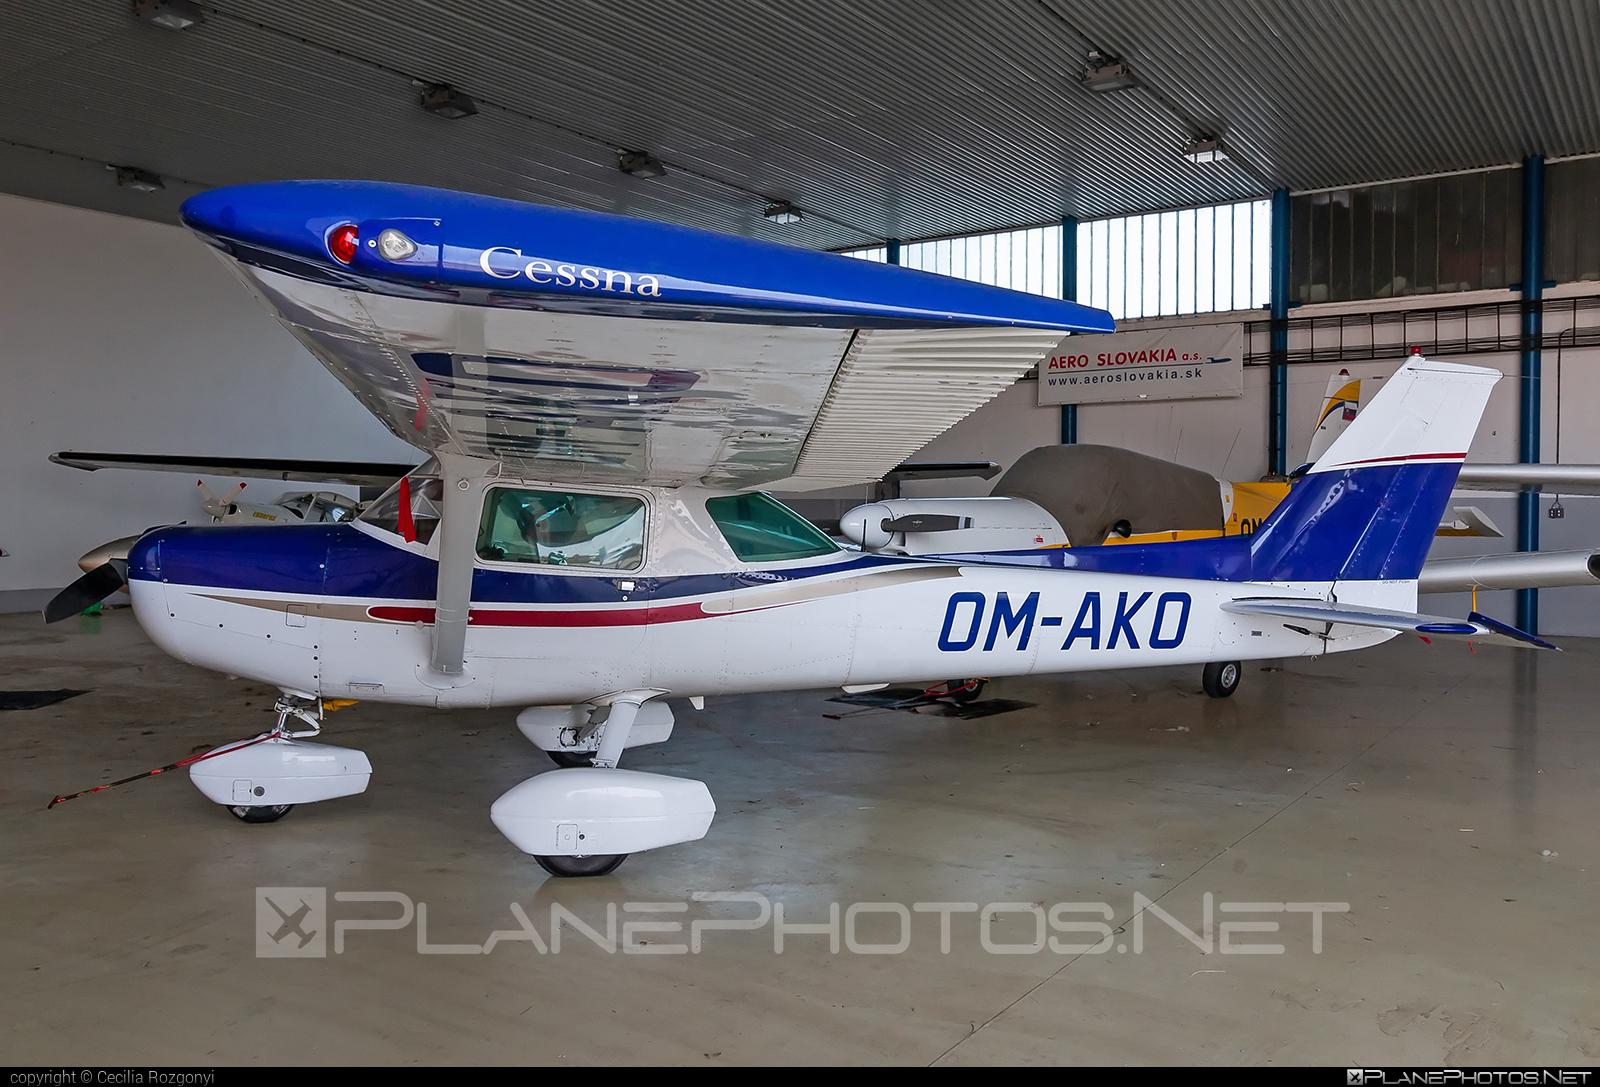 Cessna A152 Aerobat - OM-AKO operated by AERO SLOVAKIA #aeroslovakia #cessna #cessna152 #cessna152aerobat #cessnaa152 #cessnaa152aerobat